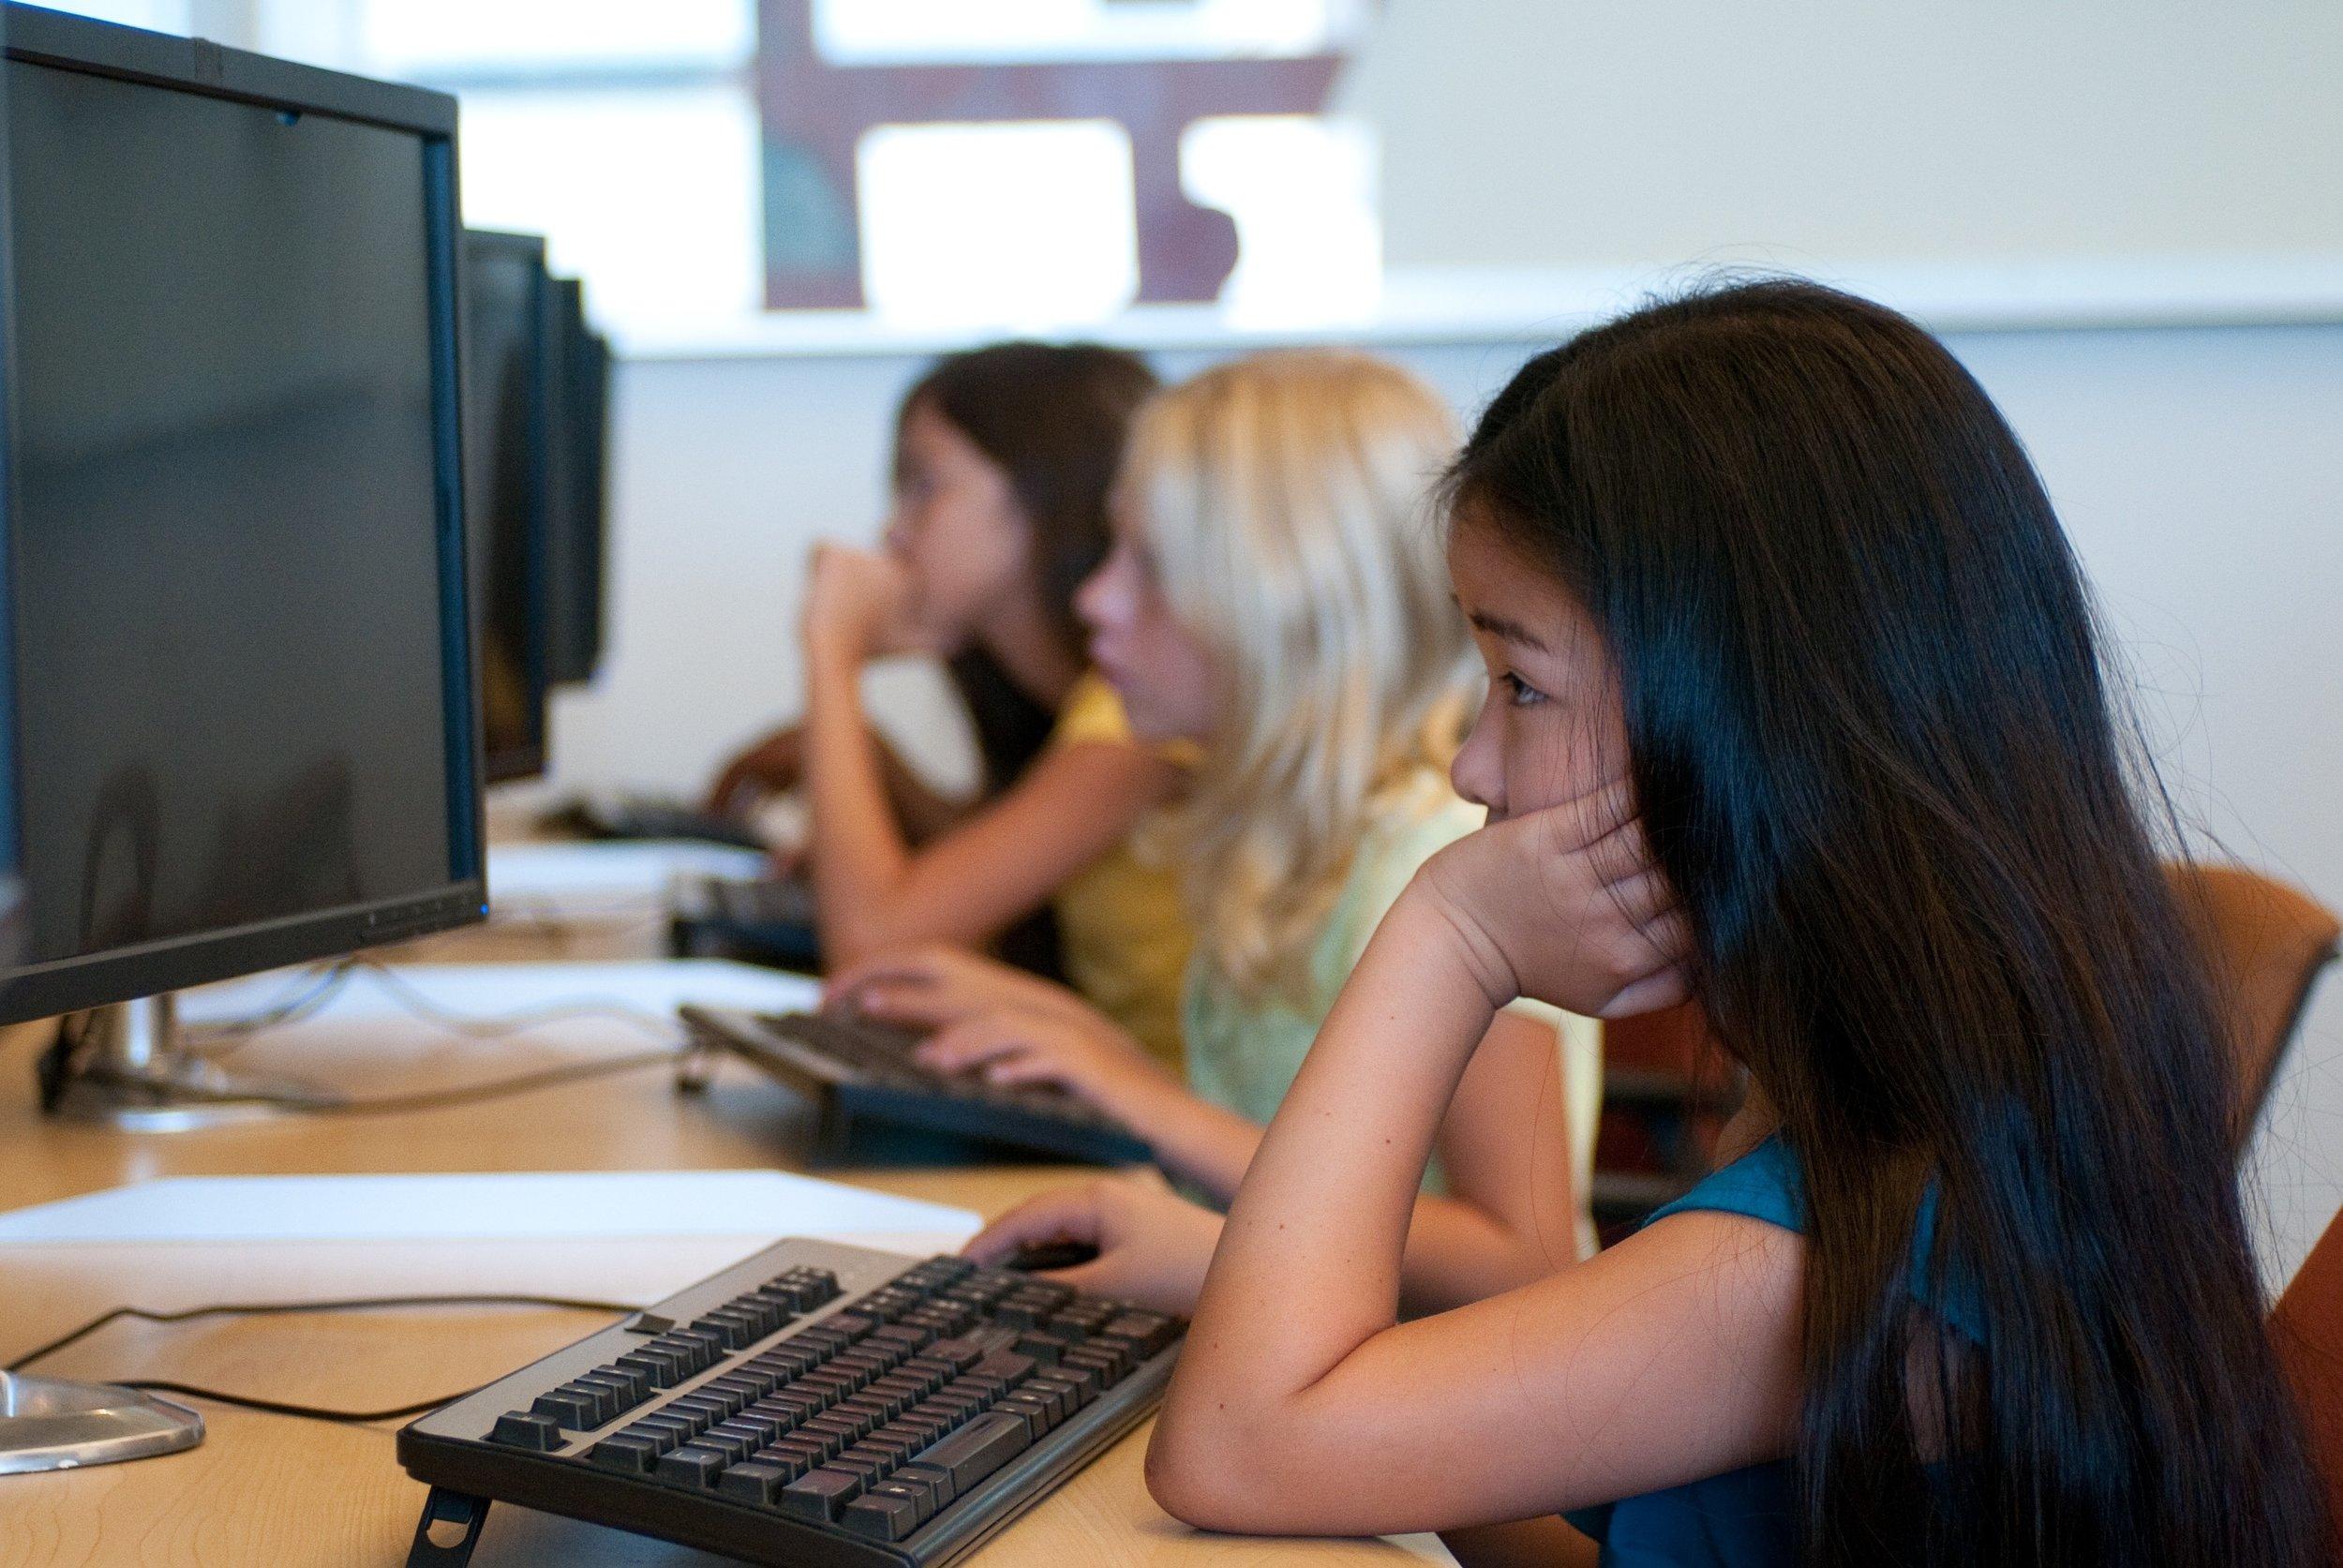 Girls on Computers.jpg